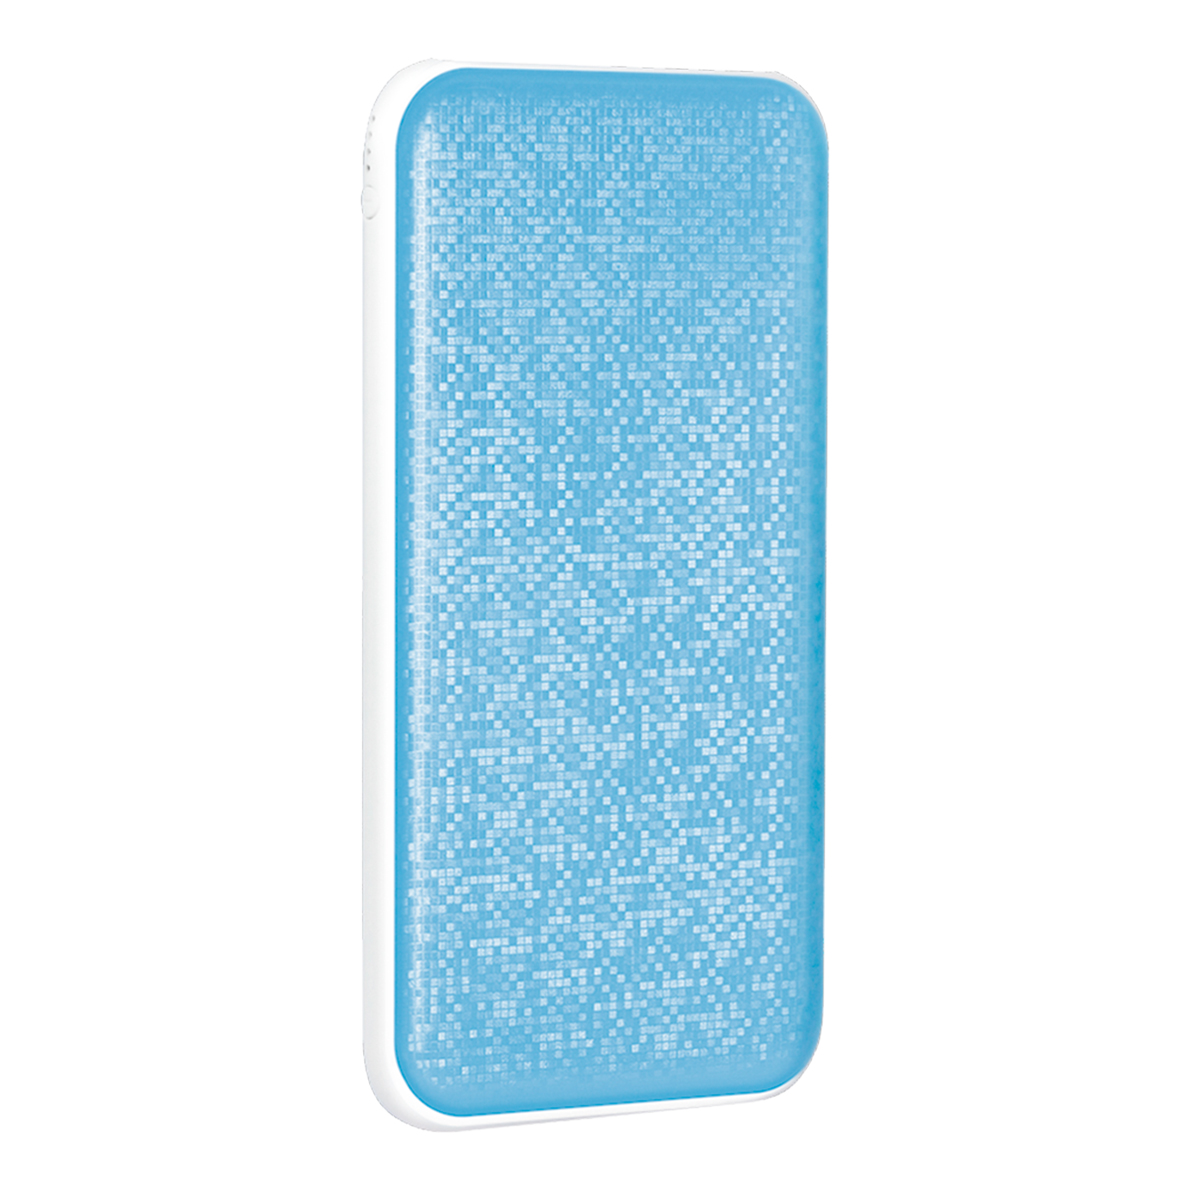 Nobby Pixel 030-001, Blue внешний аккумулятор (10 000мАч)